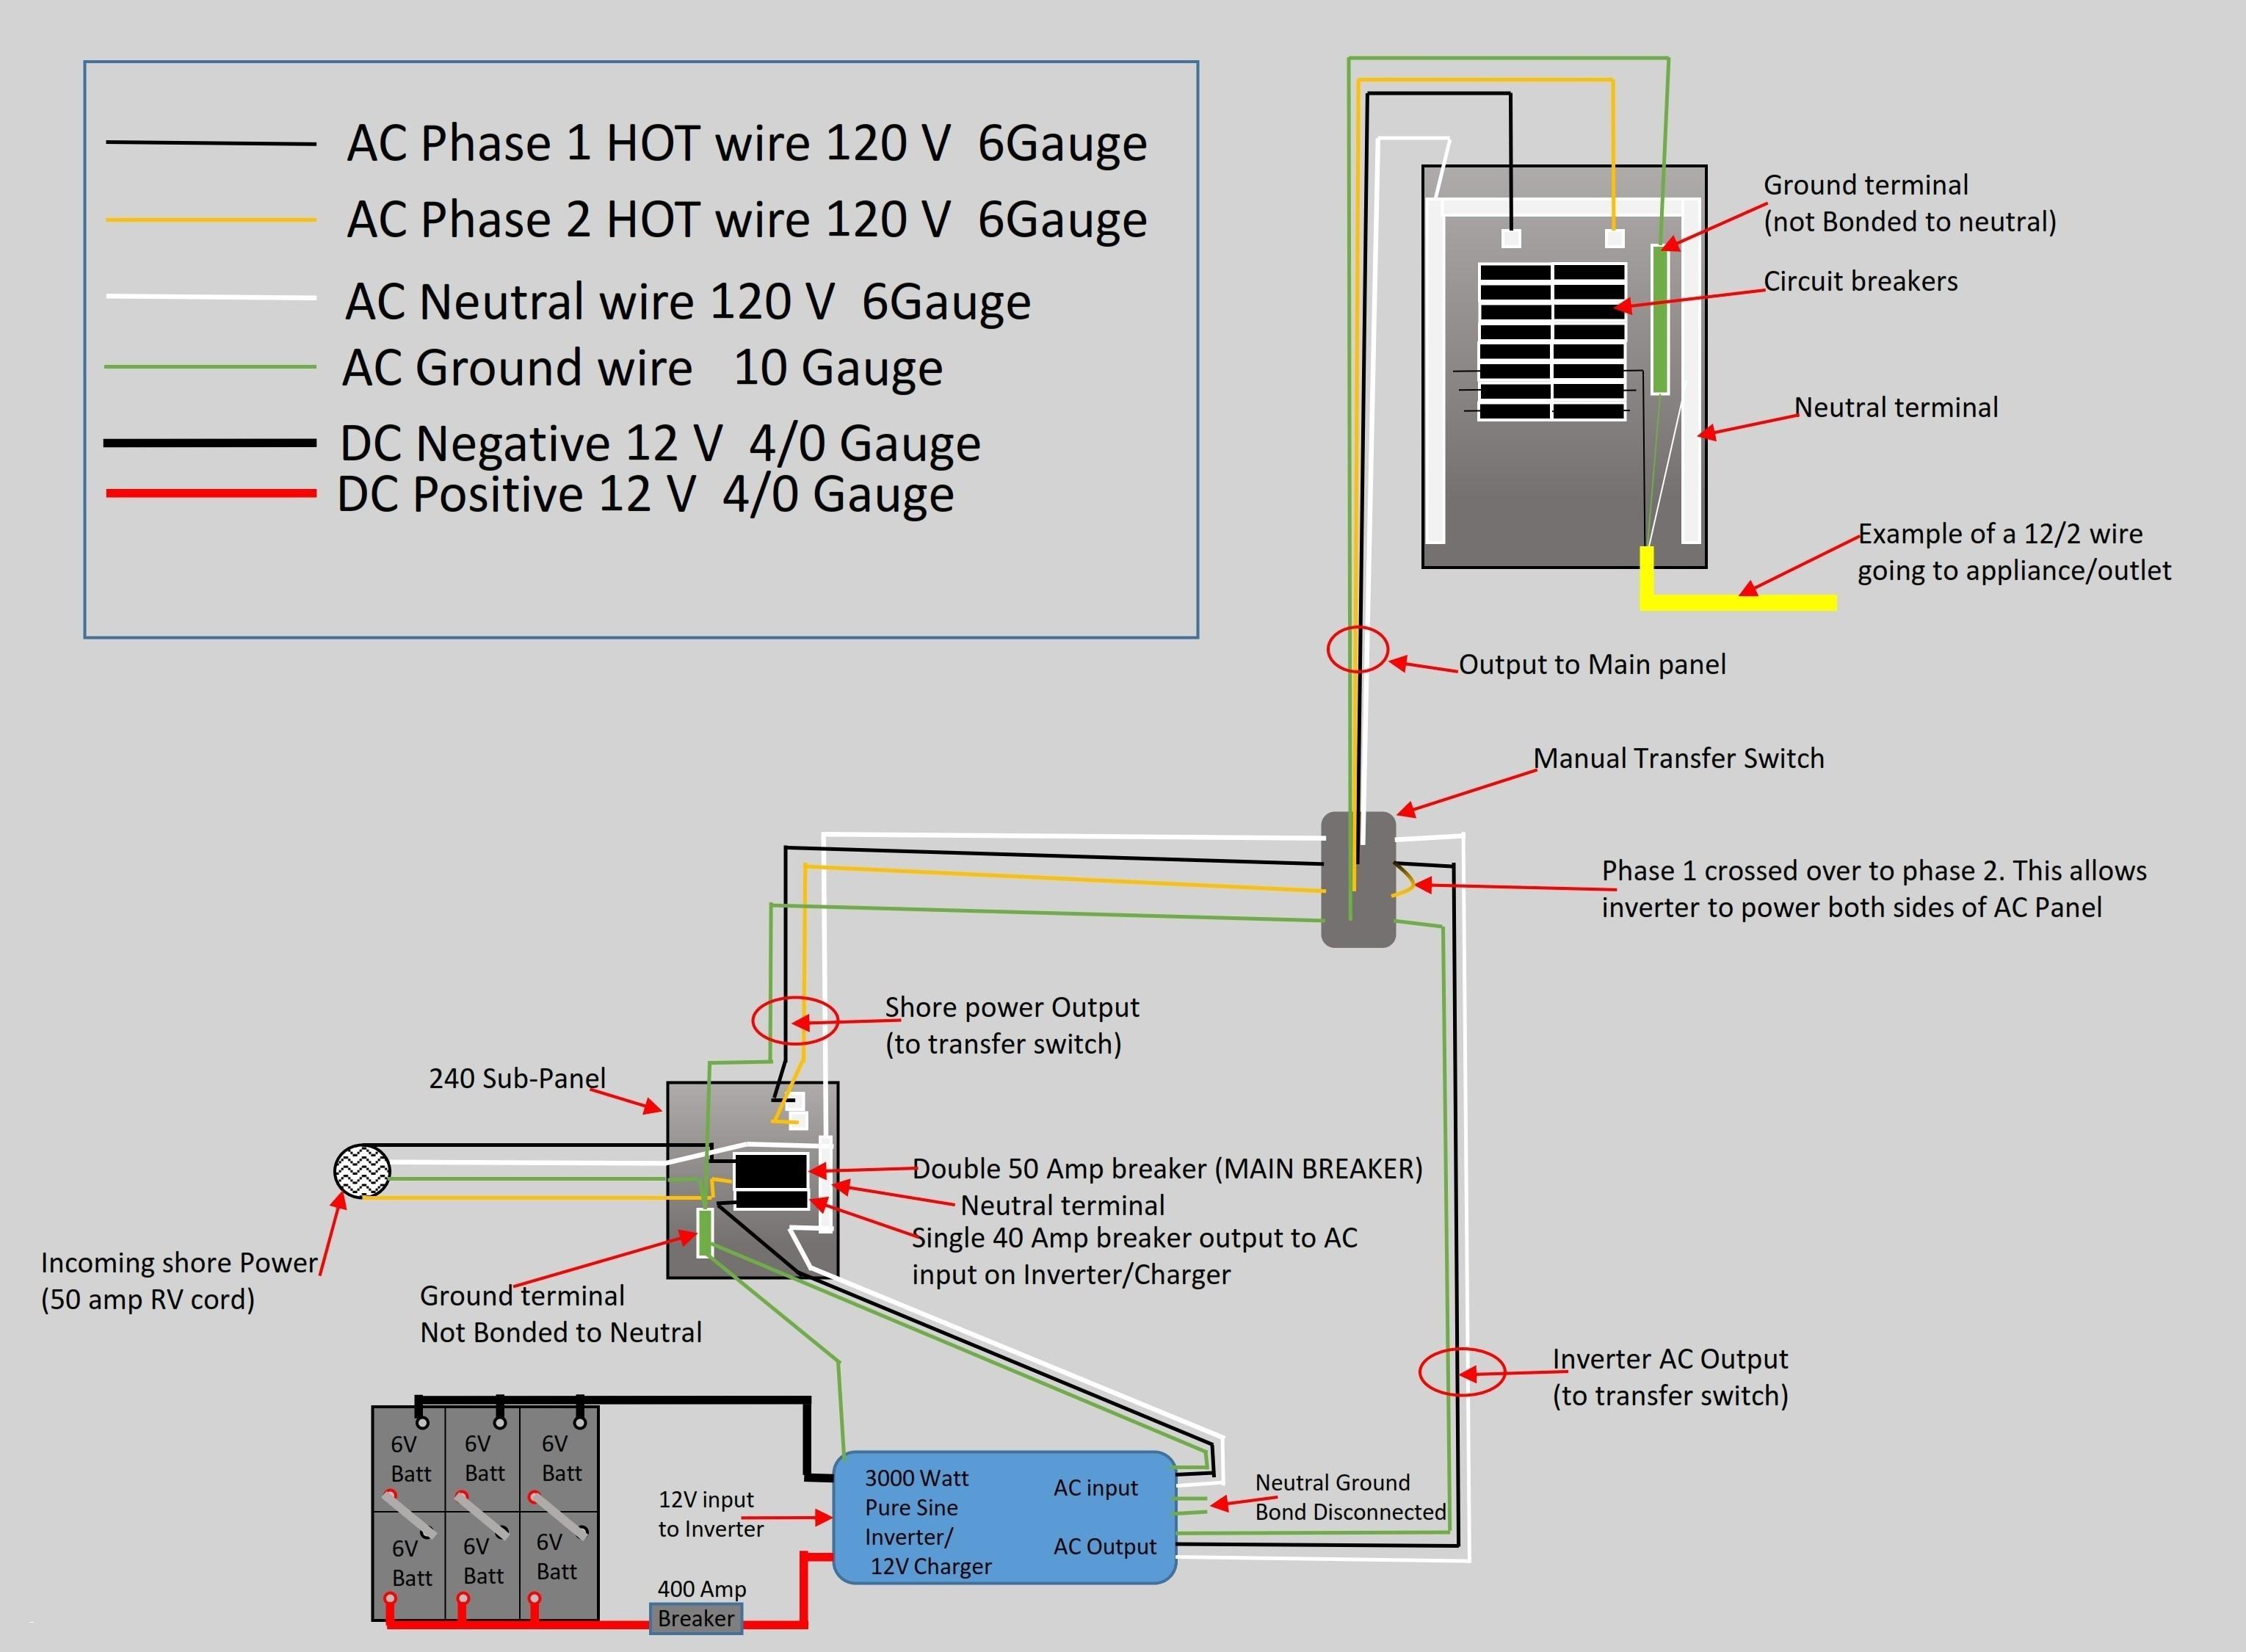 Rv Plug Wiring Diagram 110V 30Ap | Wiring Diagram - 30 Amp Rv Wiring Diagram